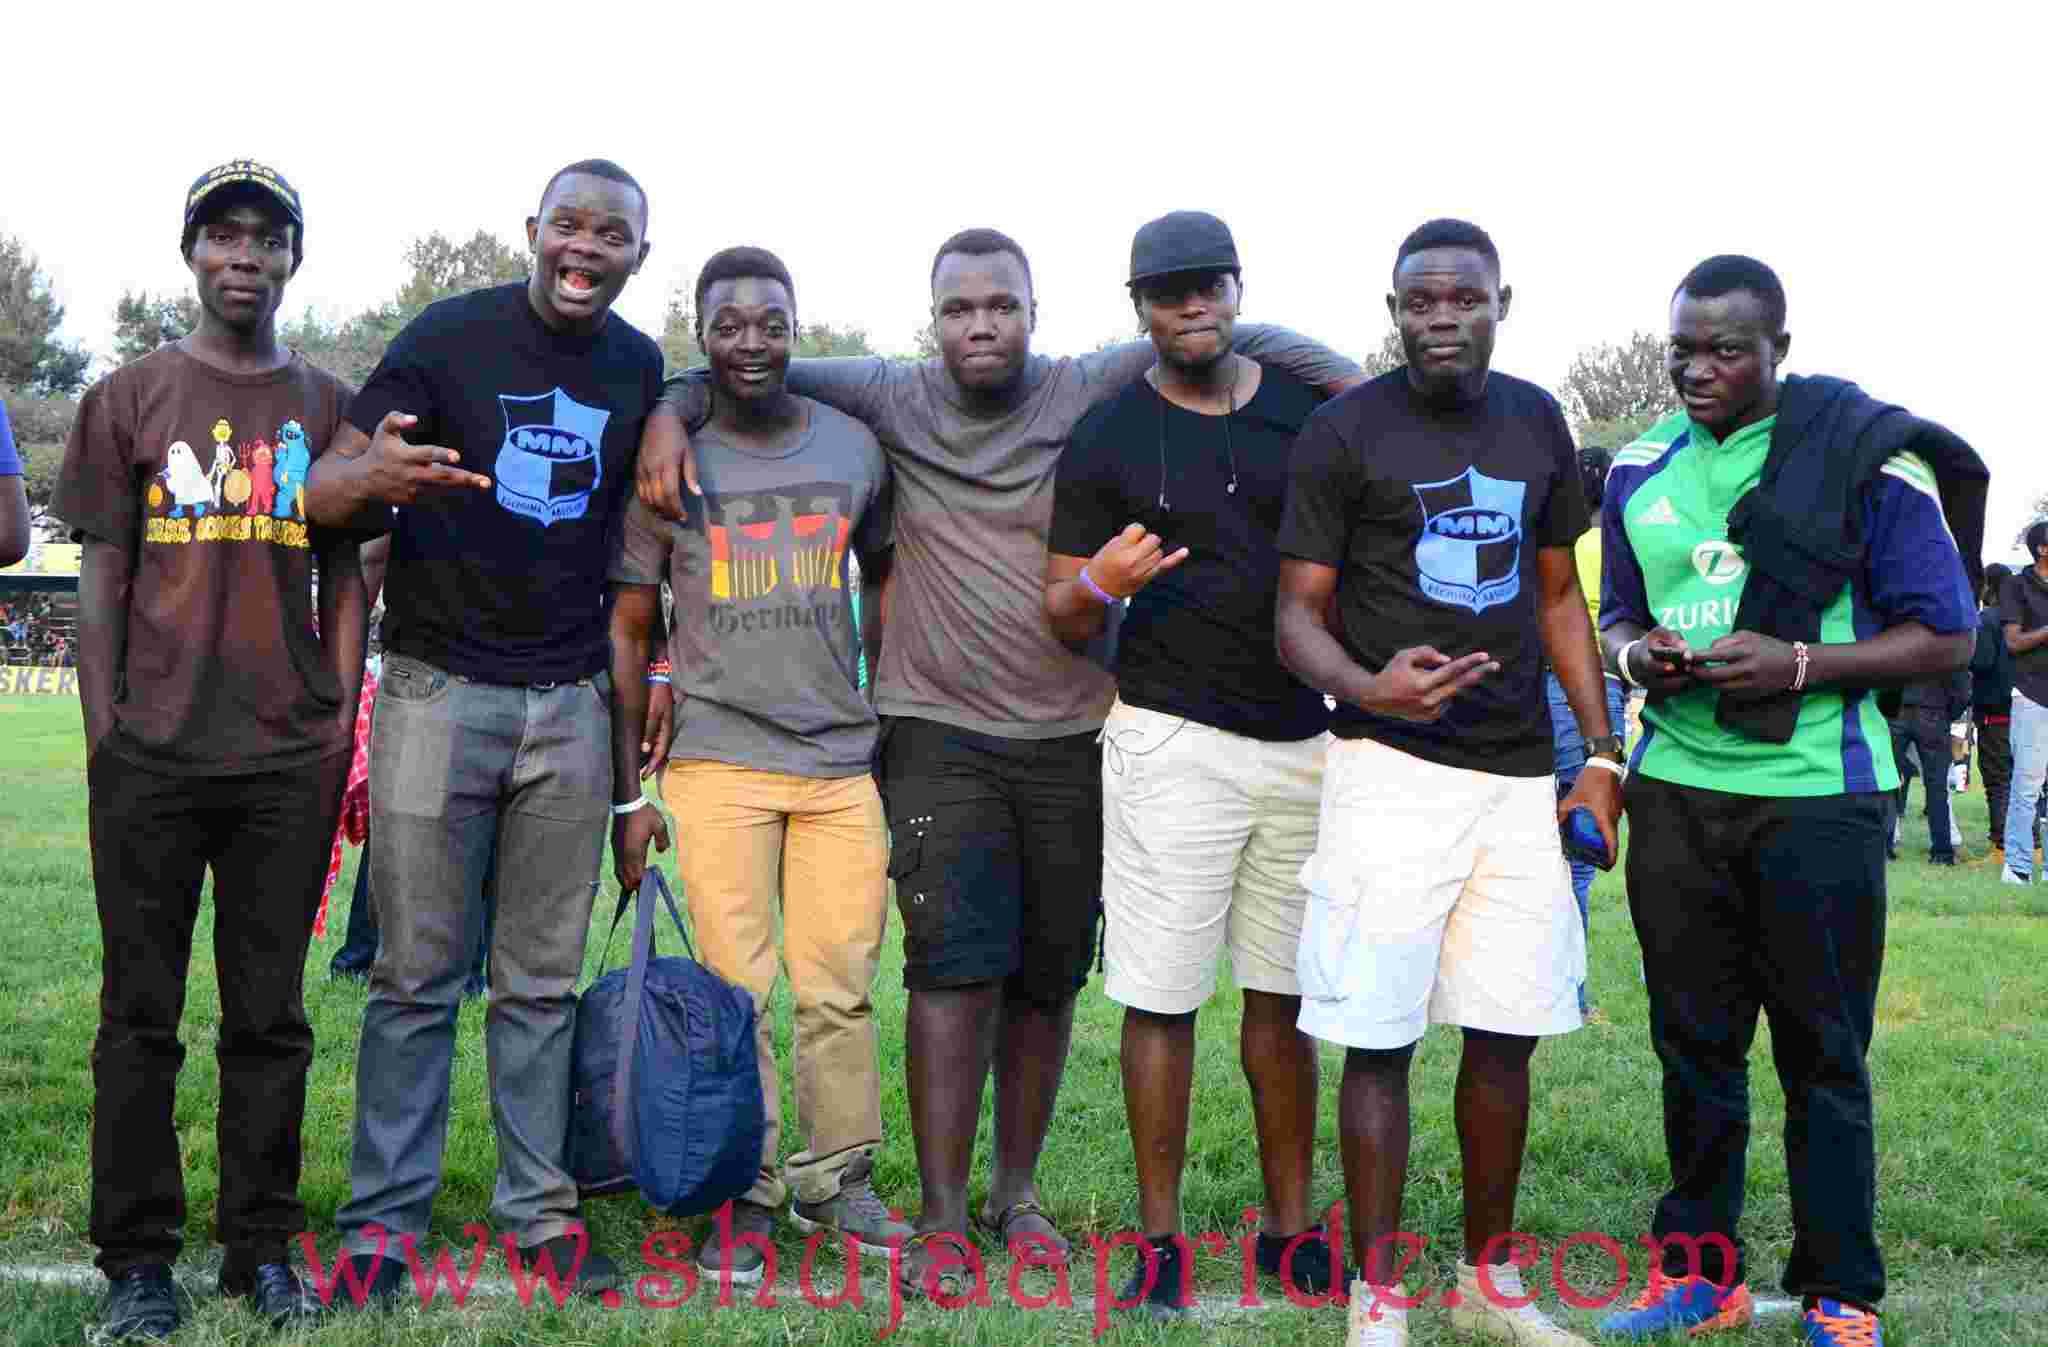 Photos : Loyal Fans at RFUEA Kenya vs Uganda